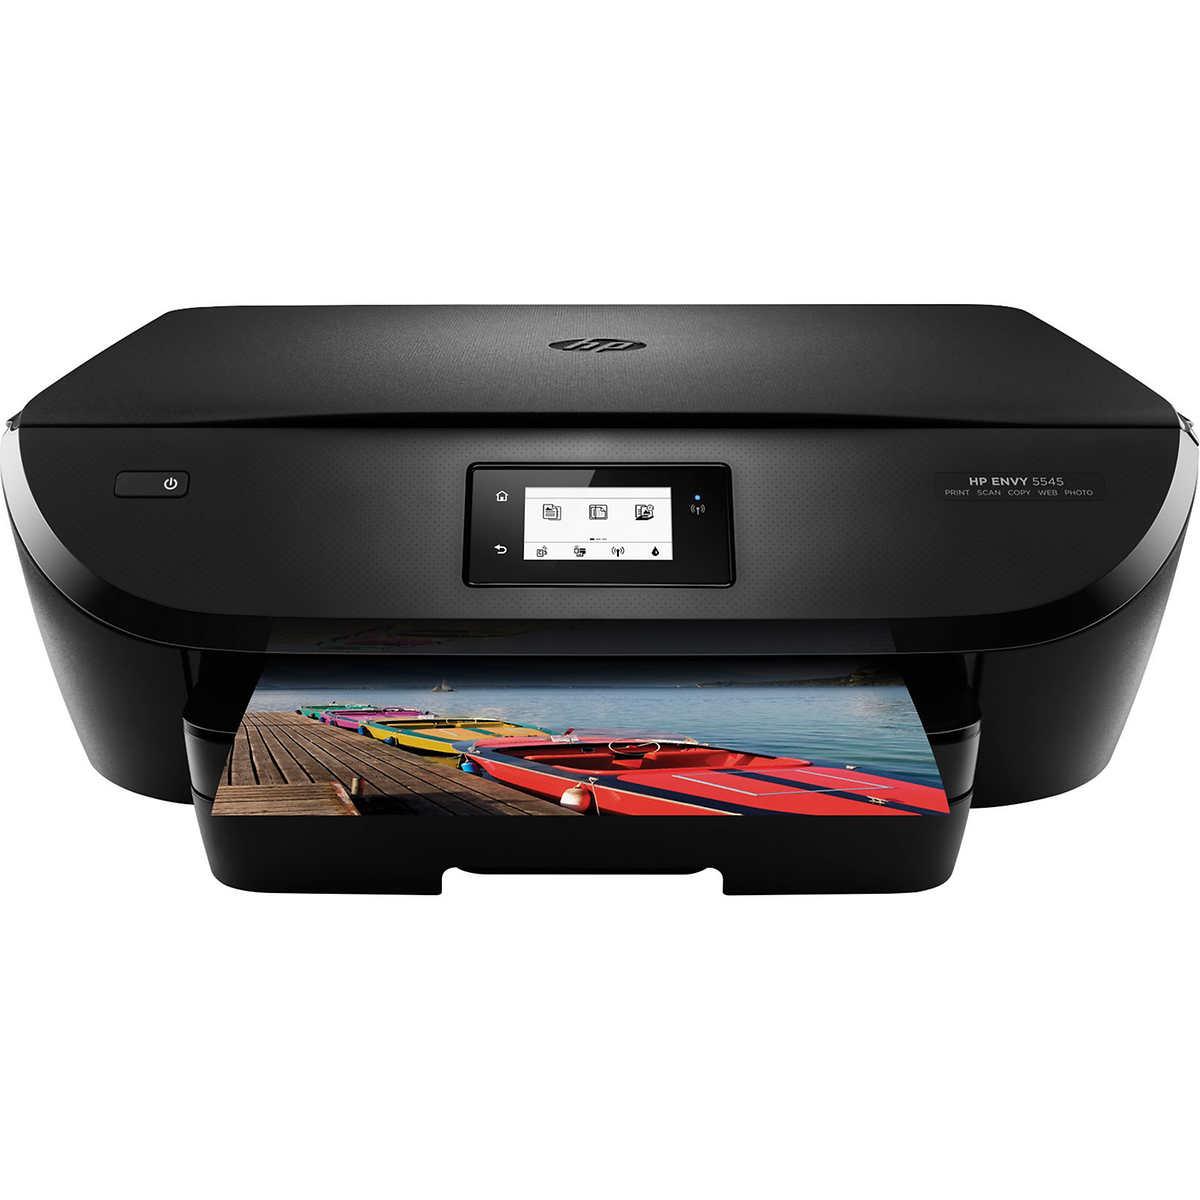 Color printing austin - Hp Envy 5545 All In One Inkjet Color Printer